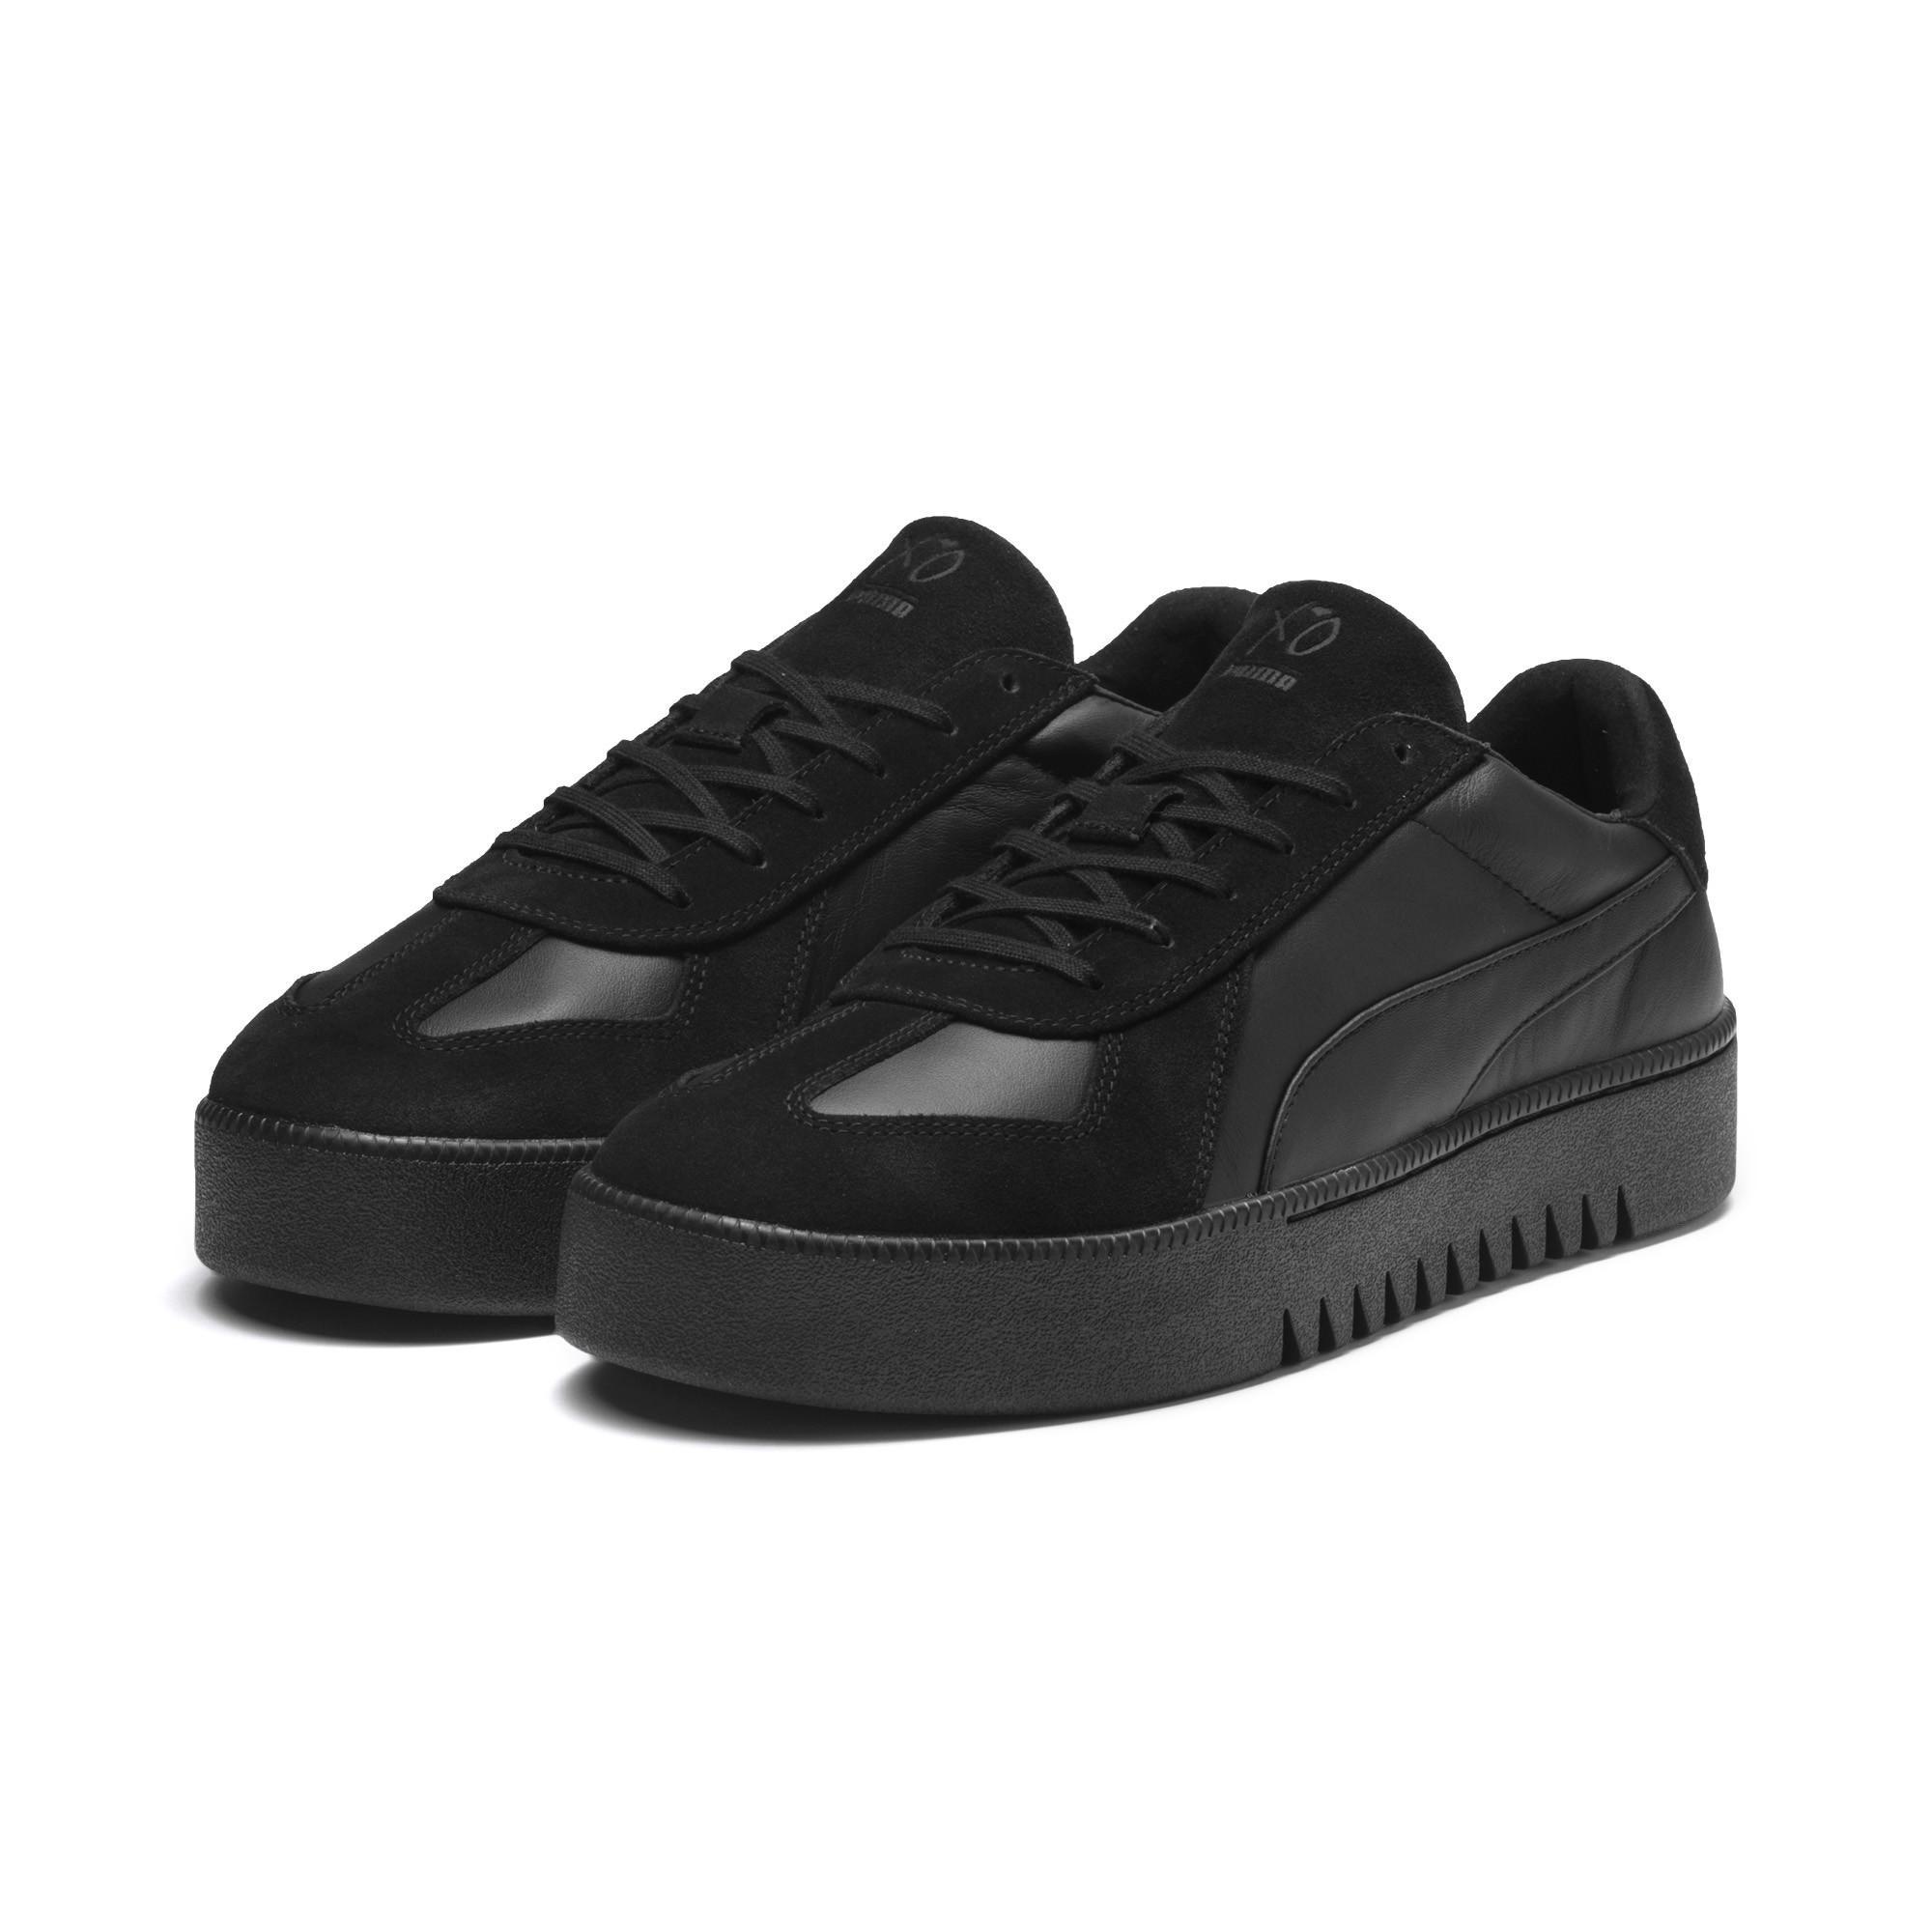 PUMA - Black X Xo Terrains Men s Sneakers for Men - Lyst. View fullscreen e4882424c